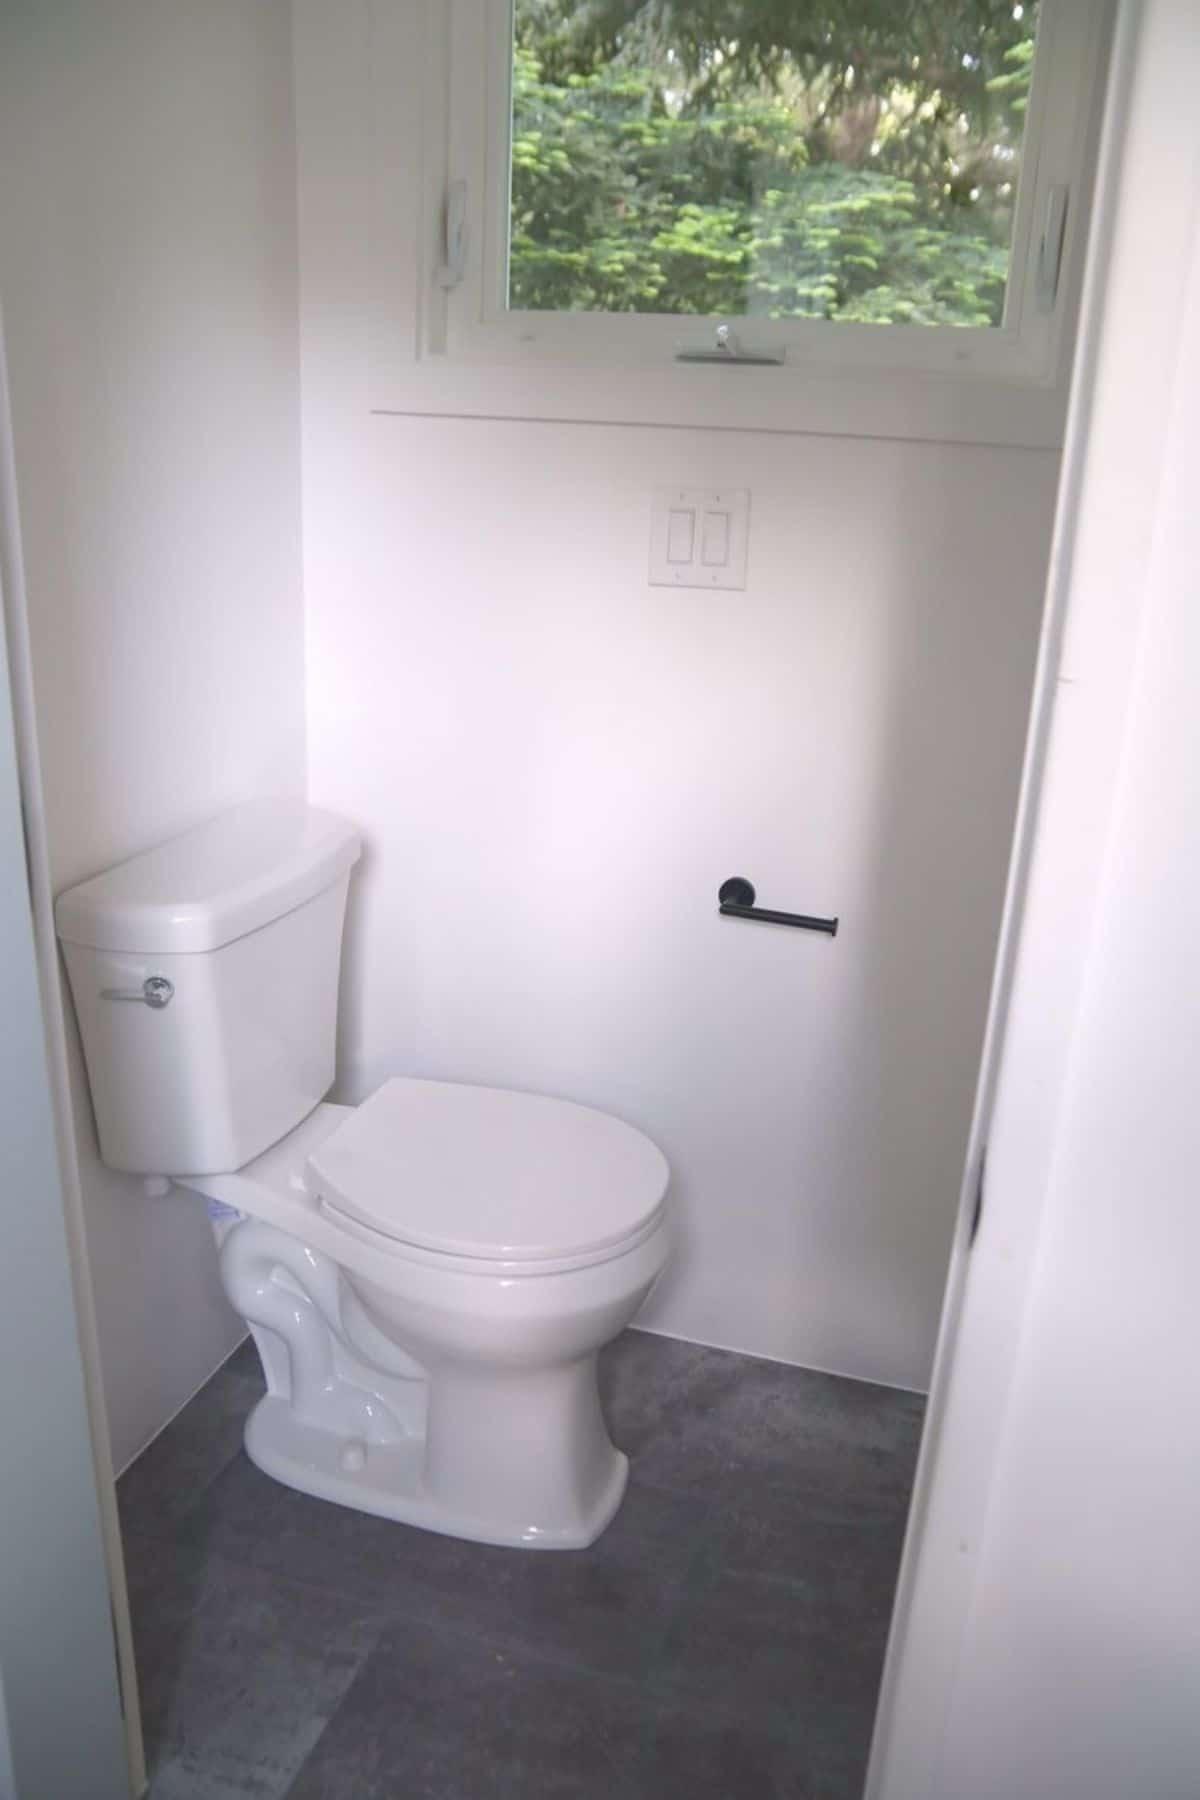 flush toilet against white wall below window